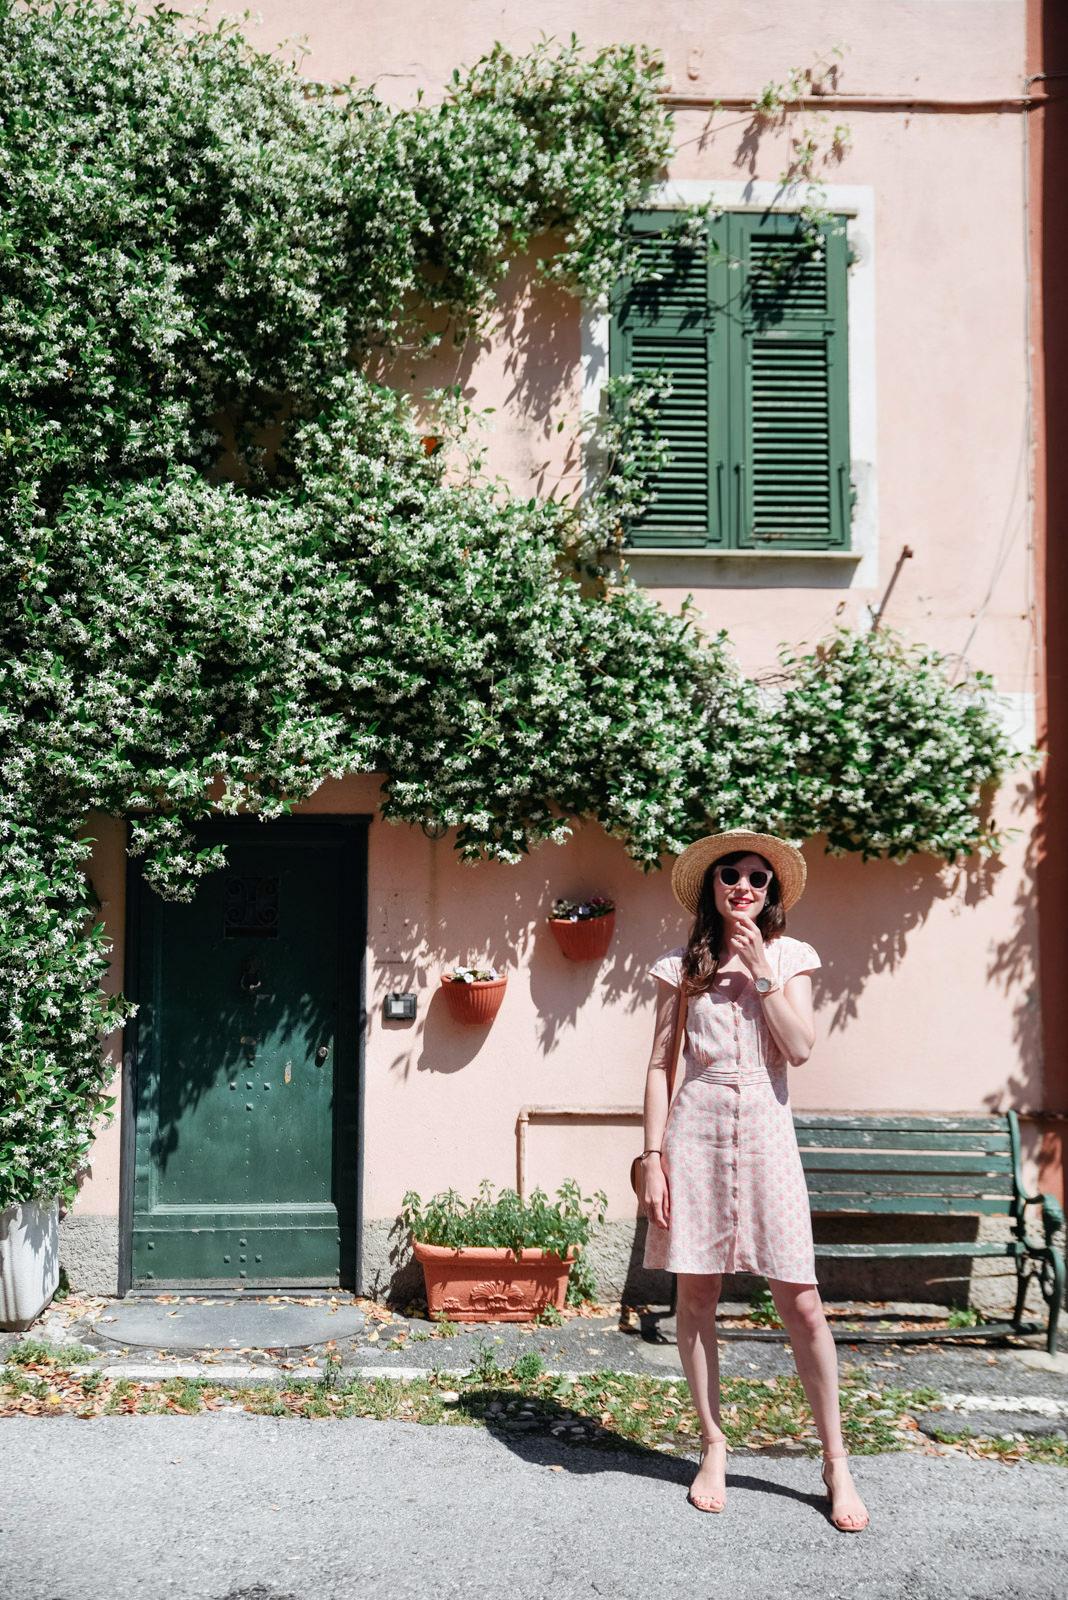 Blog-Mode-And-The-City-Lifestyle-Italie-Bocadasse-Camogli-Sestri-Levante-15